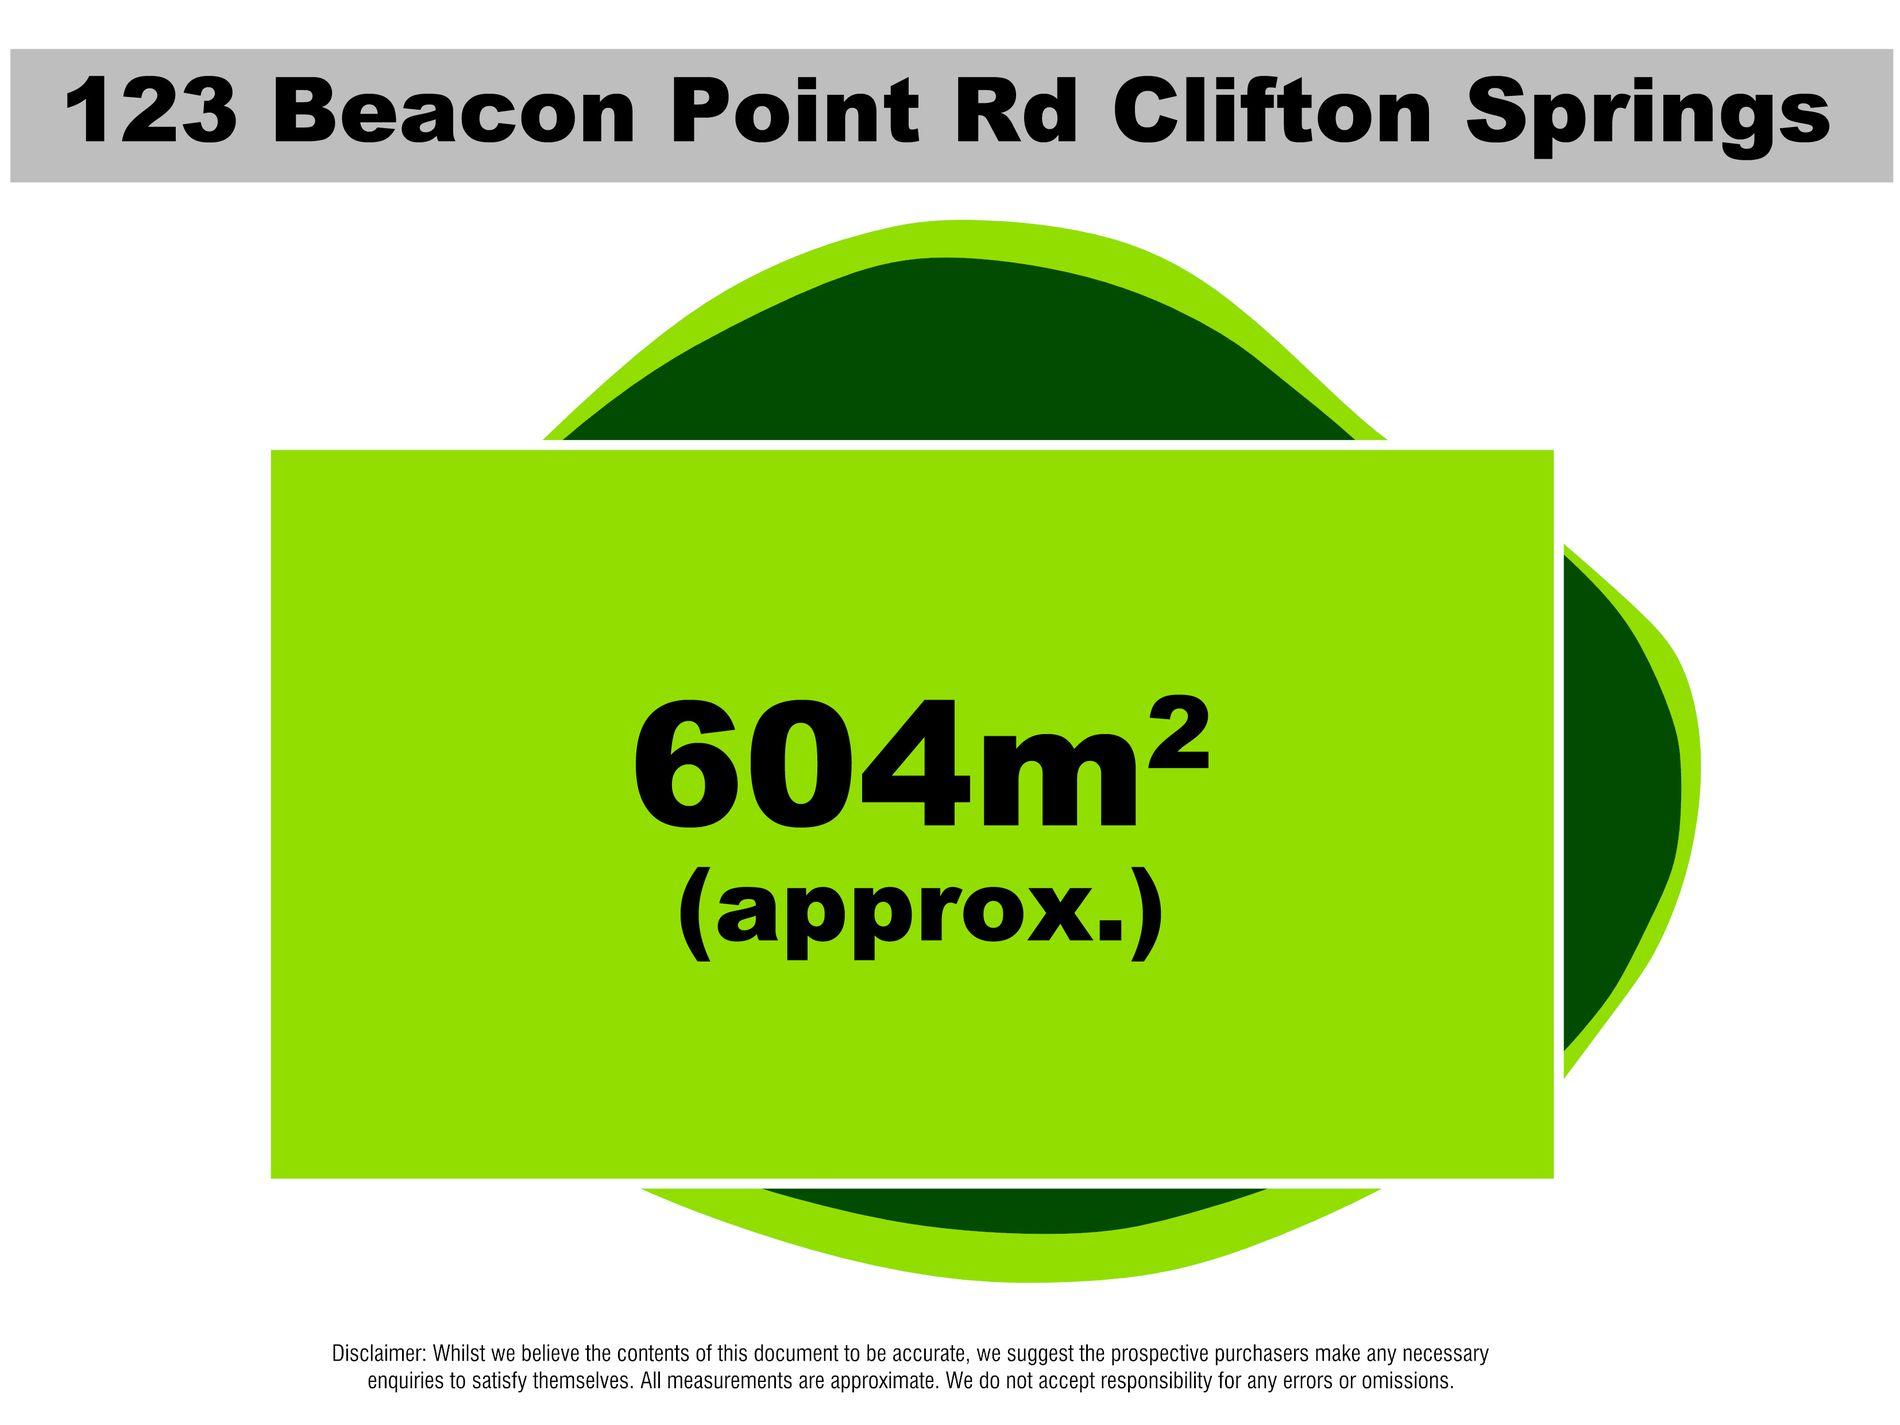 123 Beacon Point Road, Clifton Springs